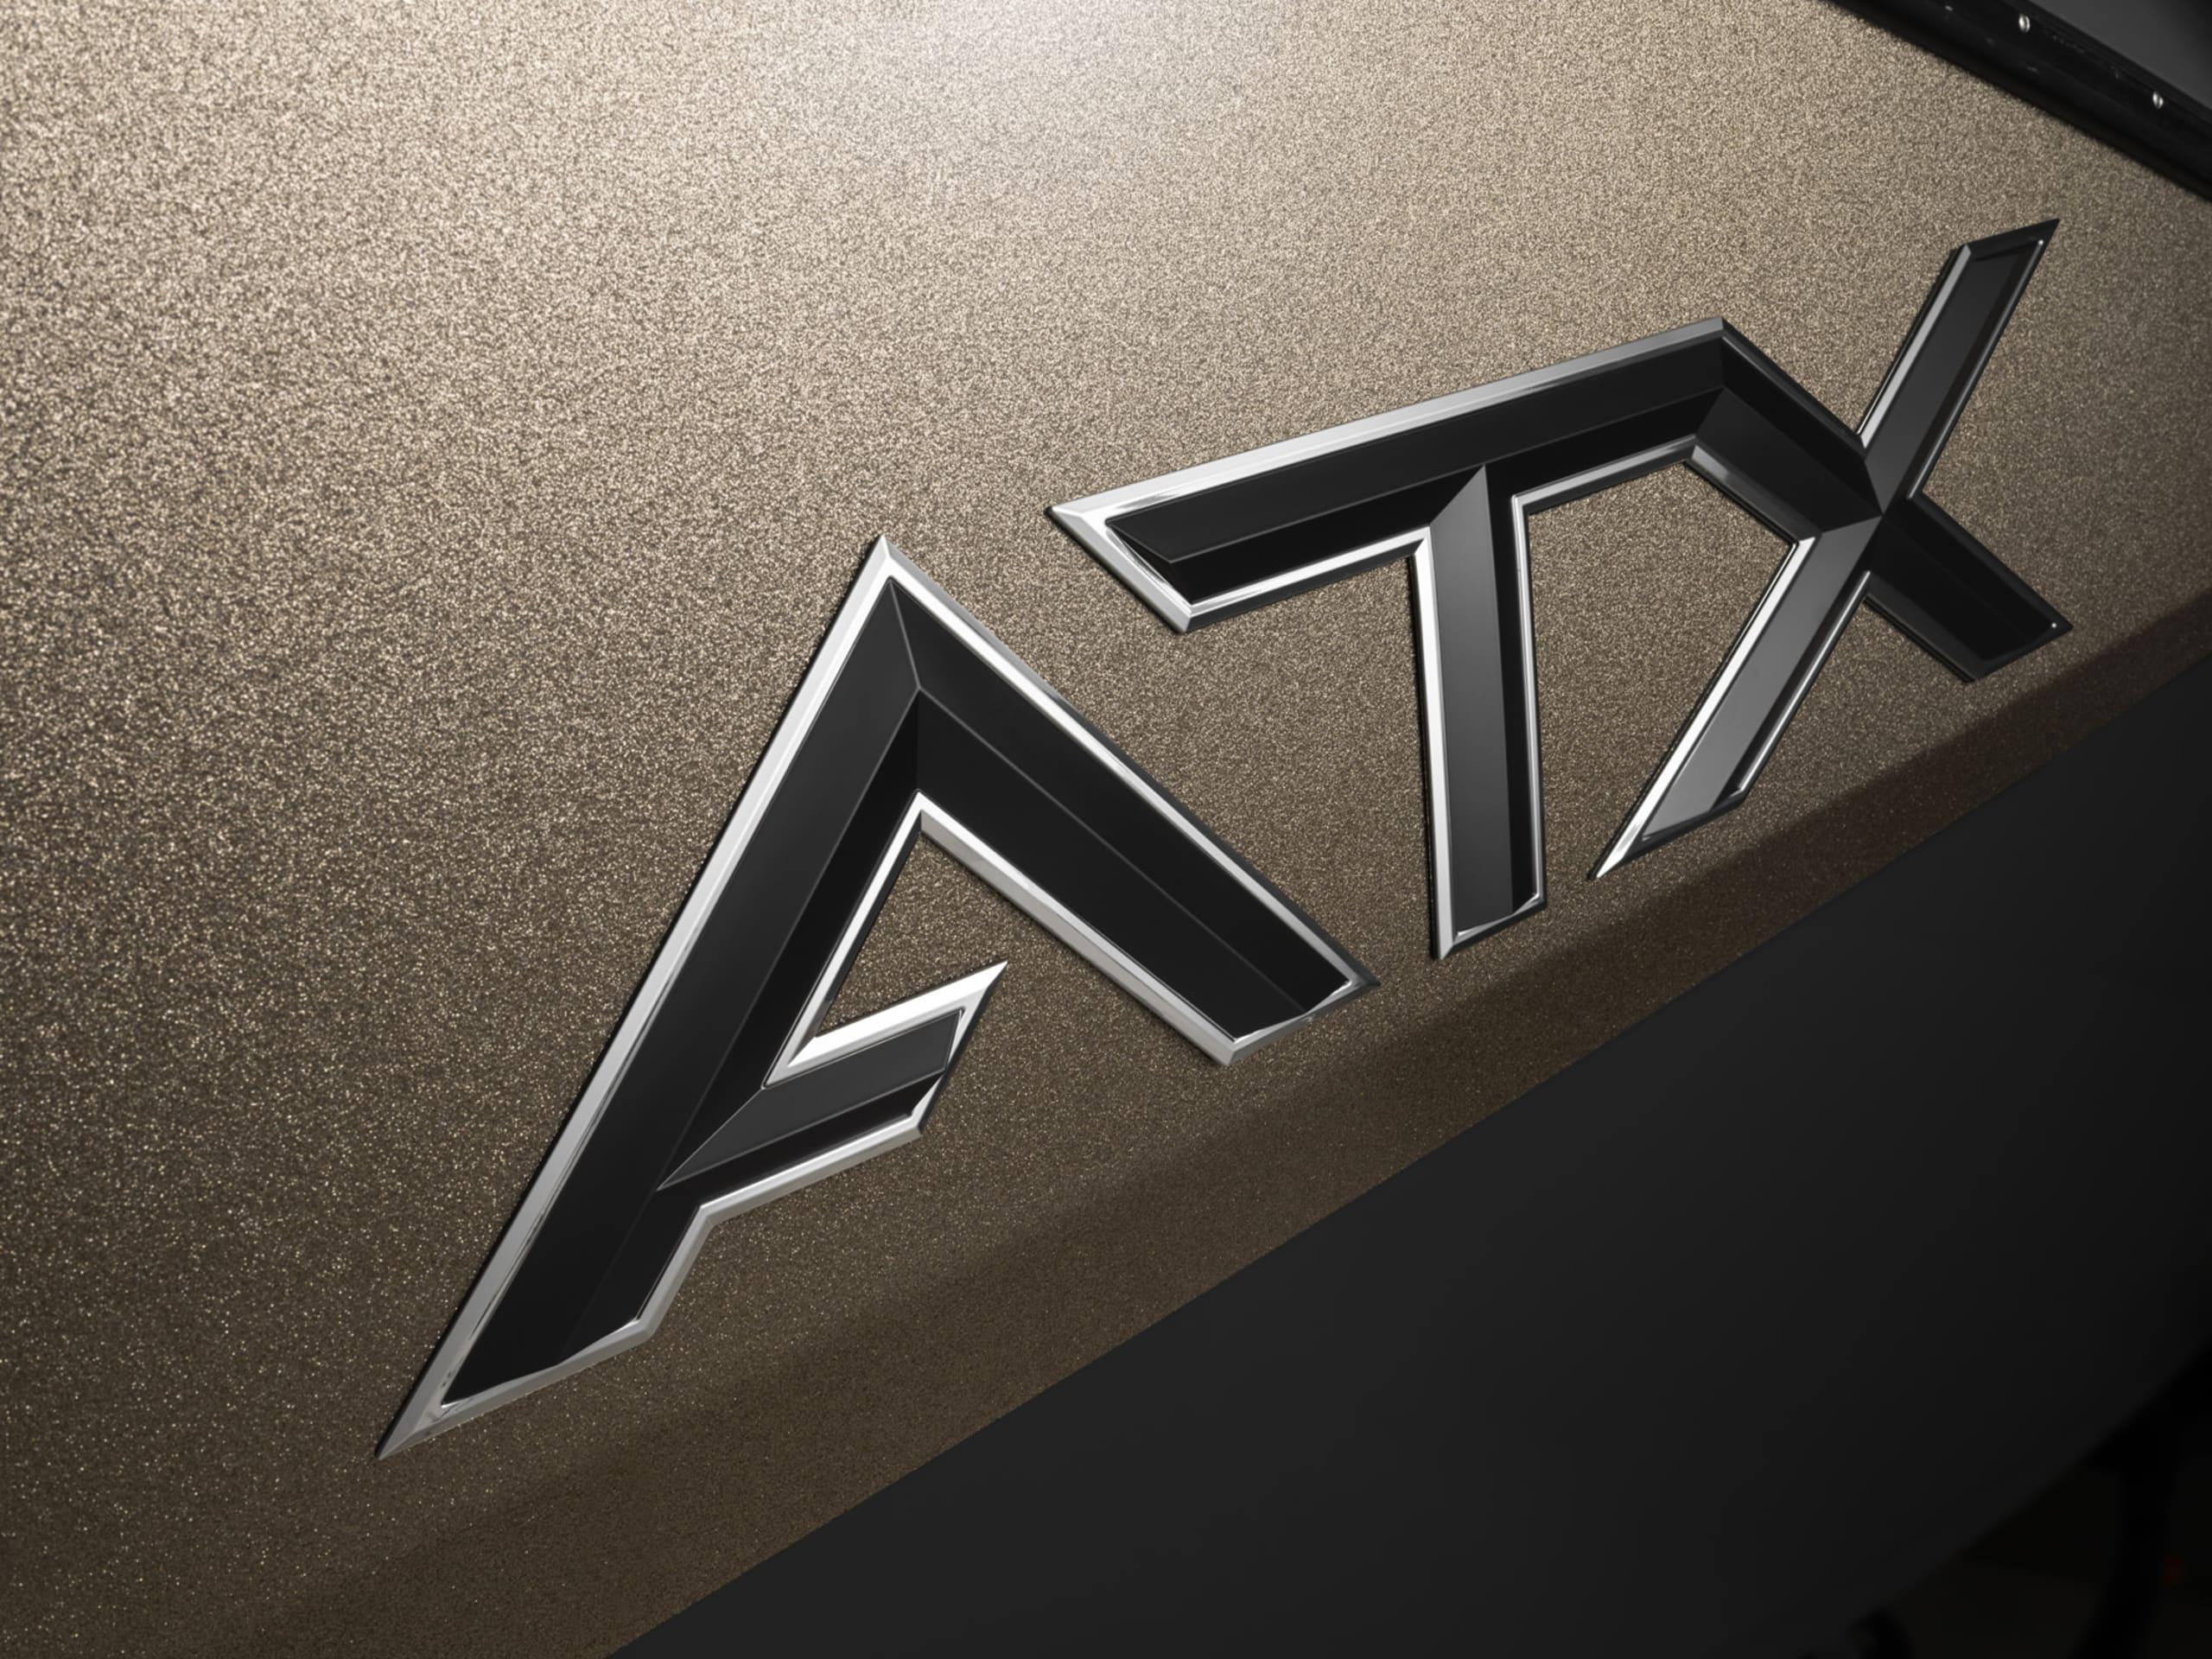 2021 ATX 22 Type S ATX Surf Boats Bradlee Rutledge 0321